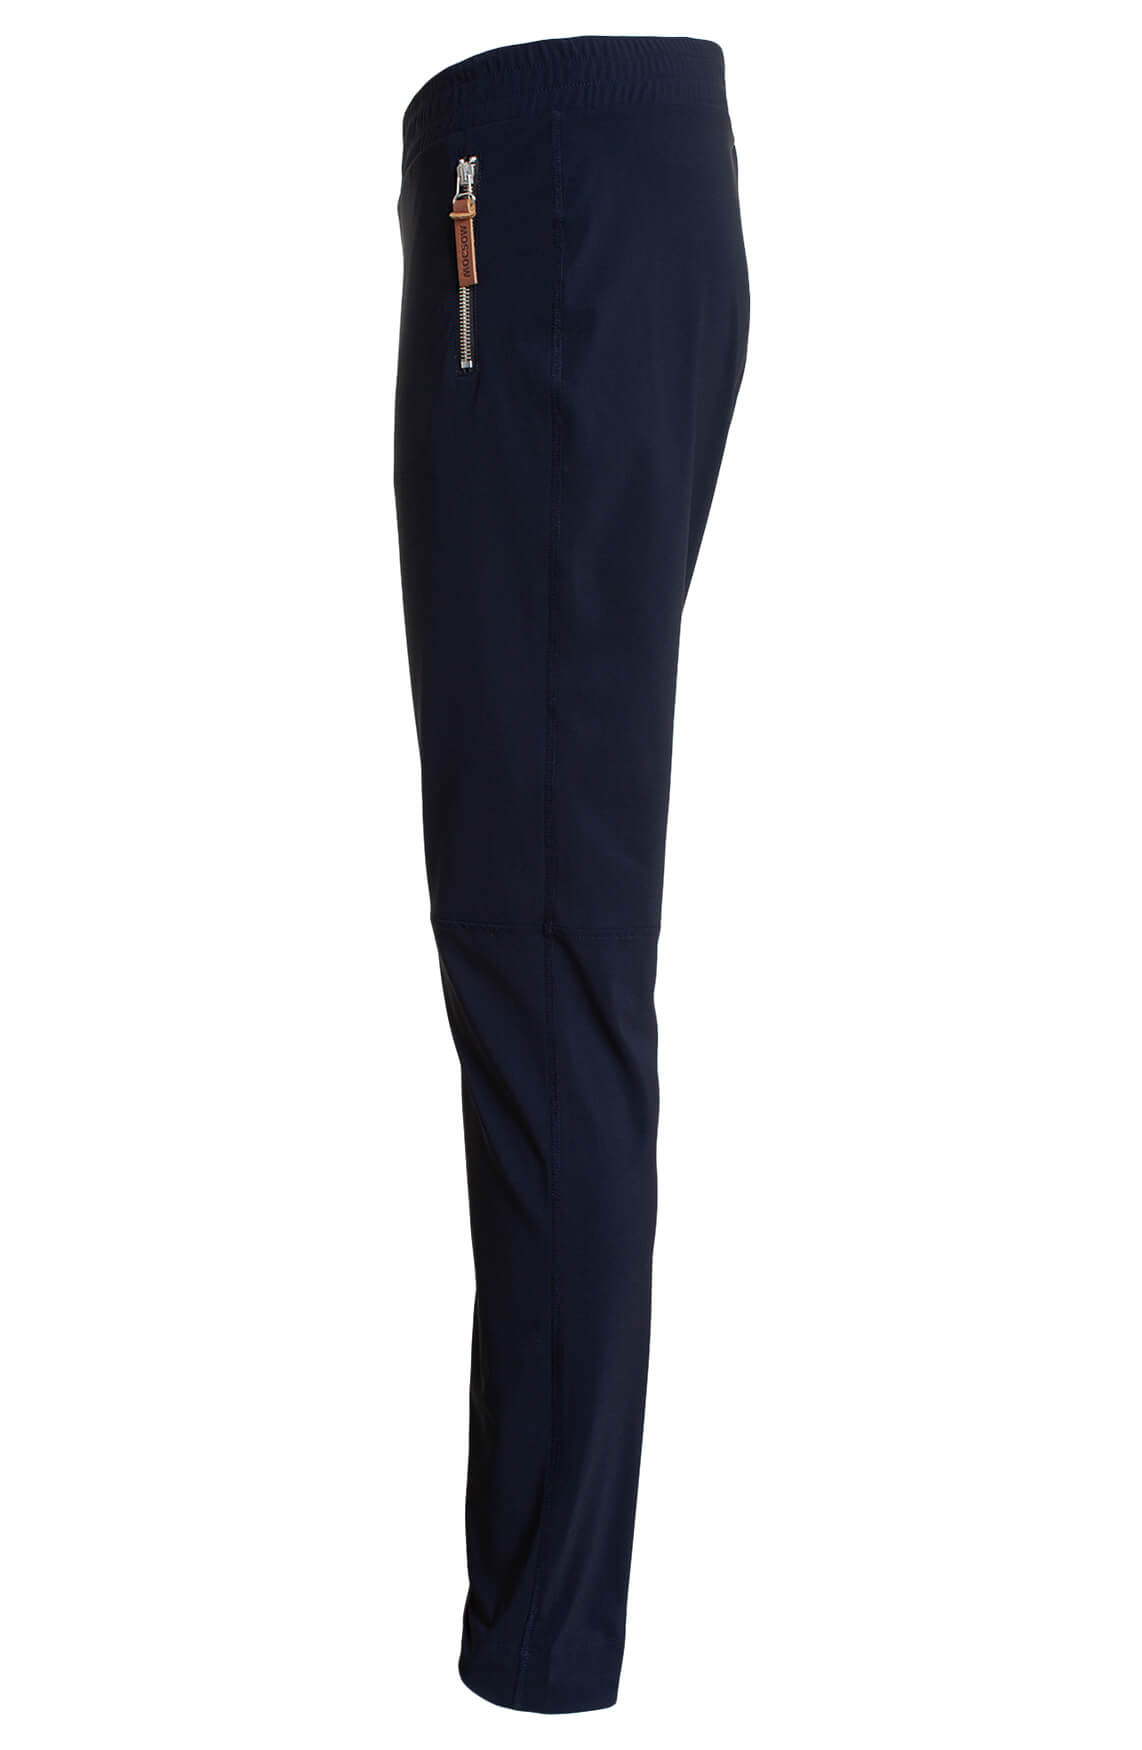 Moscow Dames Gilla jogging pants Blauw